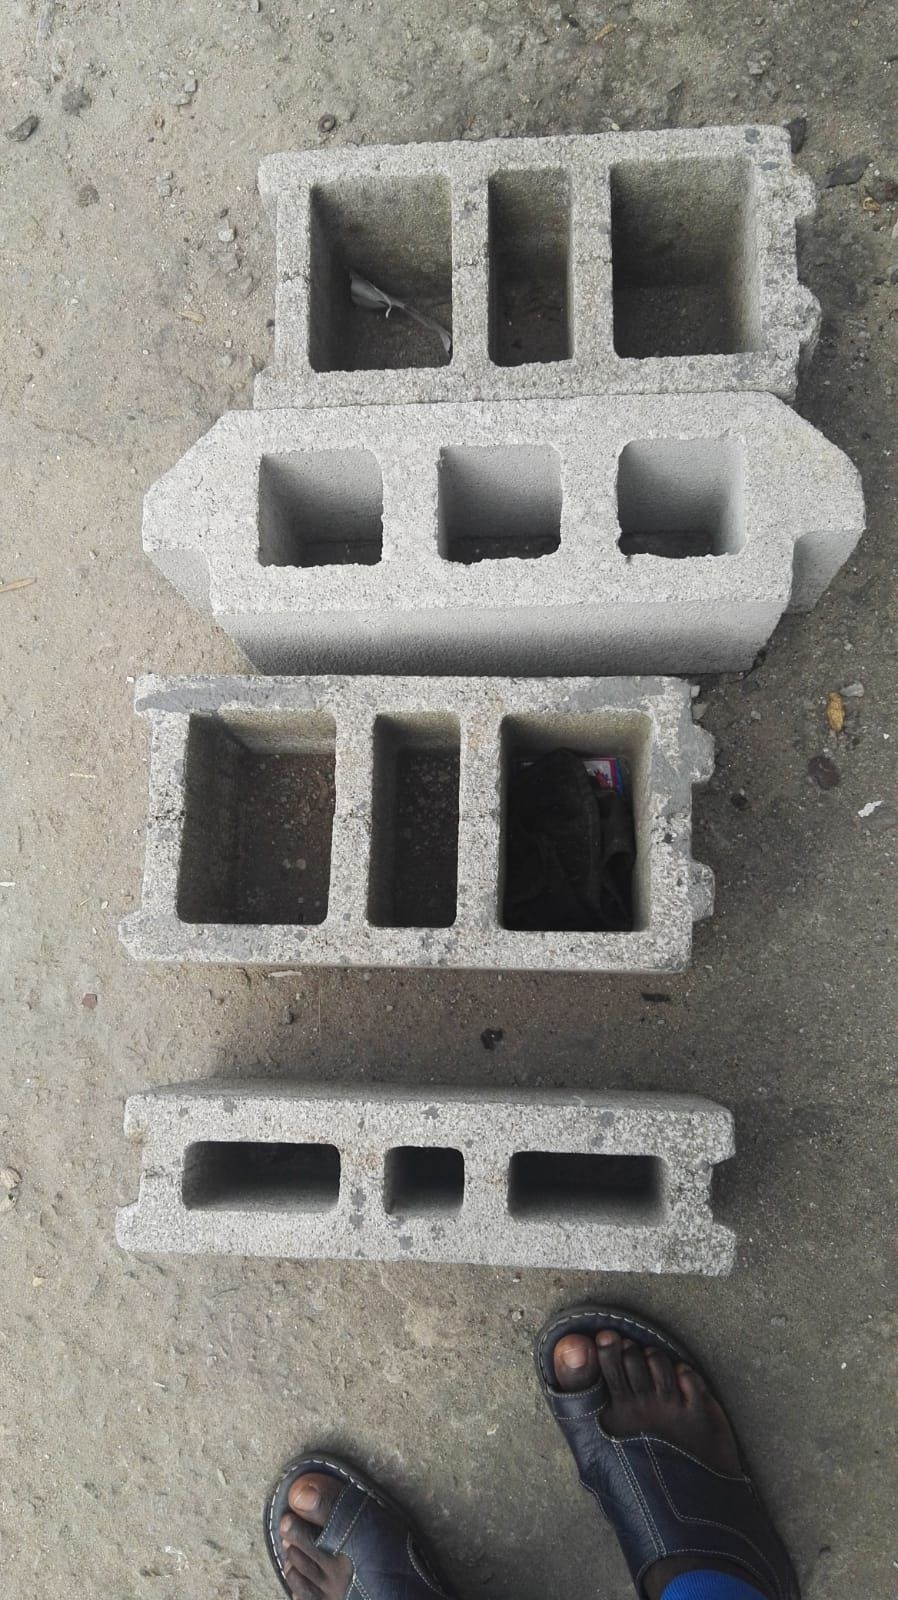 Hourdis Block Design Concrete 3holes Hollow Block In Ivory Coast Concrete Block Walls Concrete Blocks Concrete Design